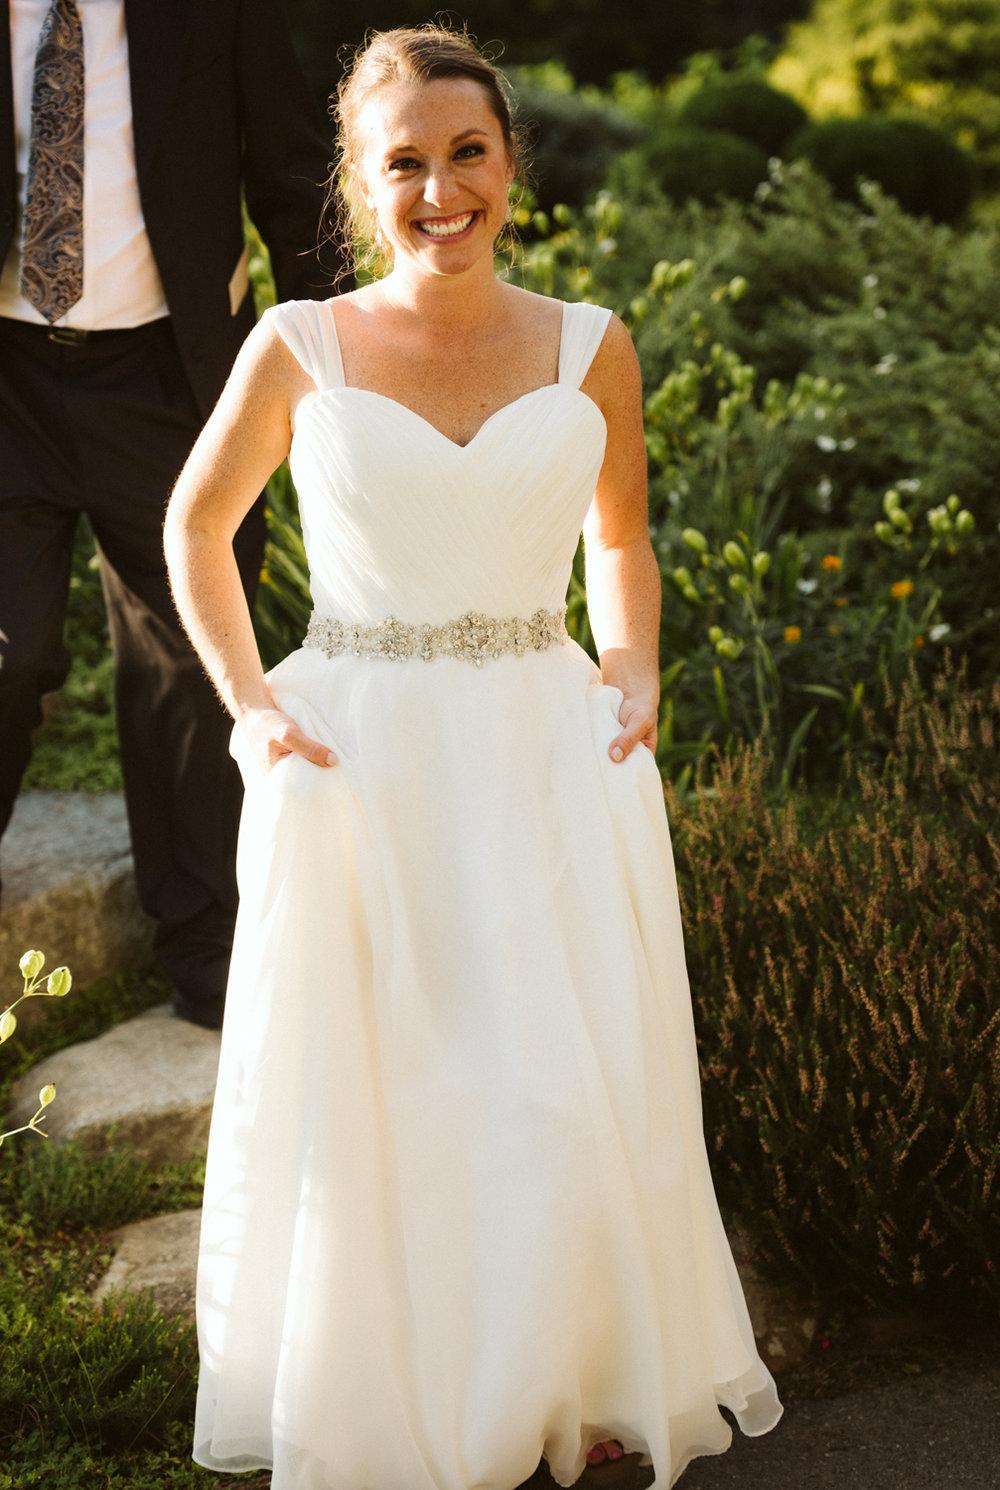 emily_alex_elm_bank_wedding_wellesley_DSC_8023.jpg